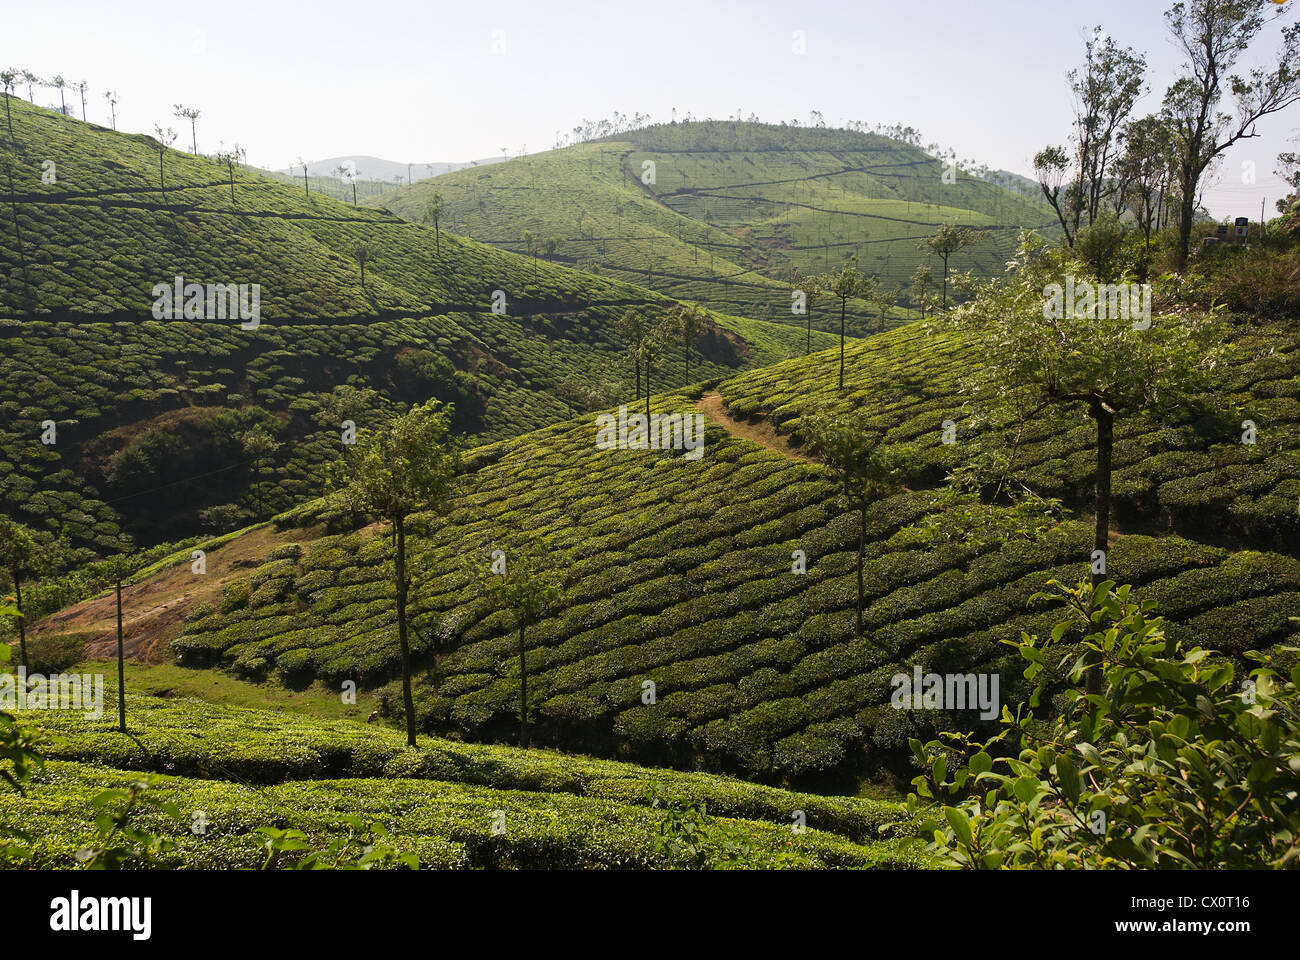 Visit To The Tea Plantation Stock Photos & Visit To The Tea ...